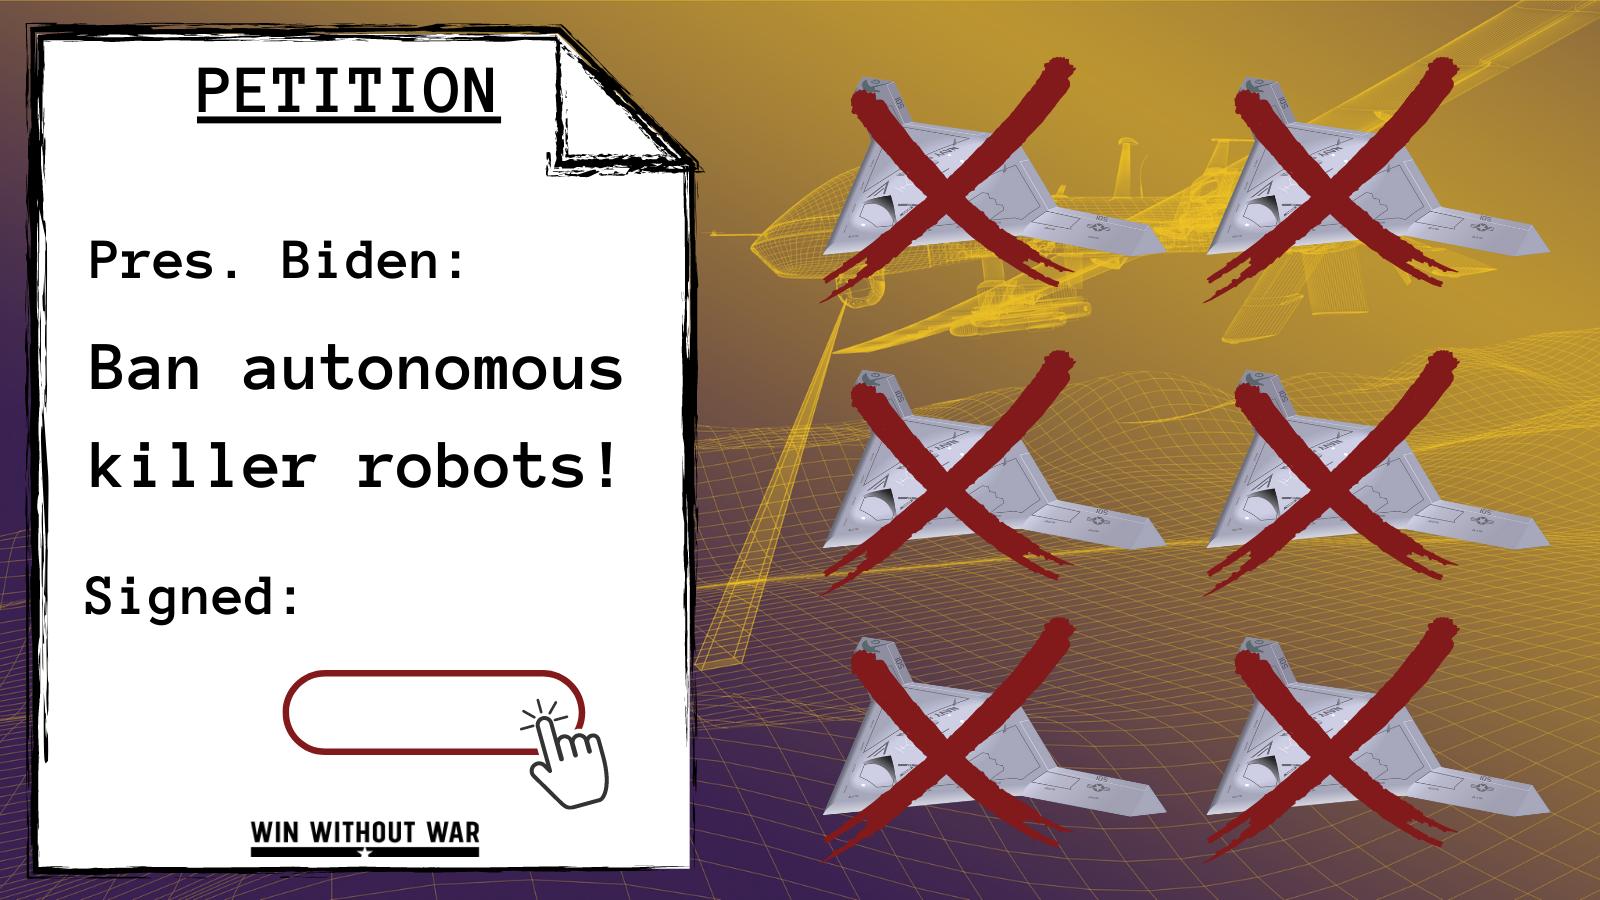 President Biden: Ban autonomous killer robots!